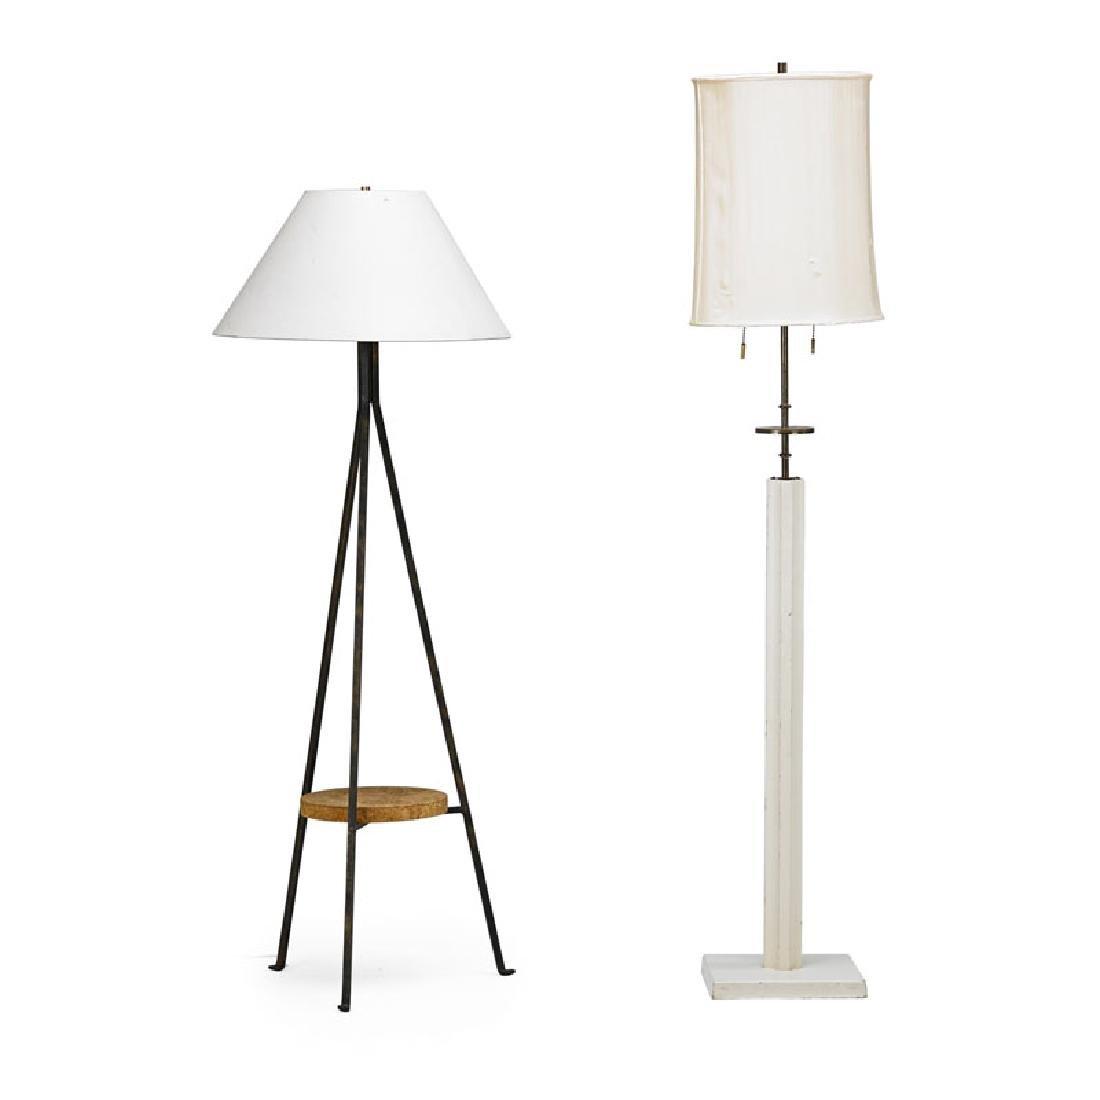 TOMMI PARZINGER Two floor lamps